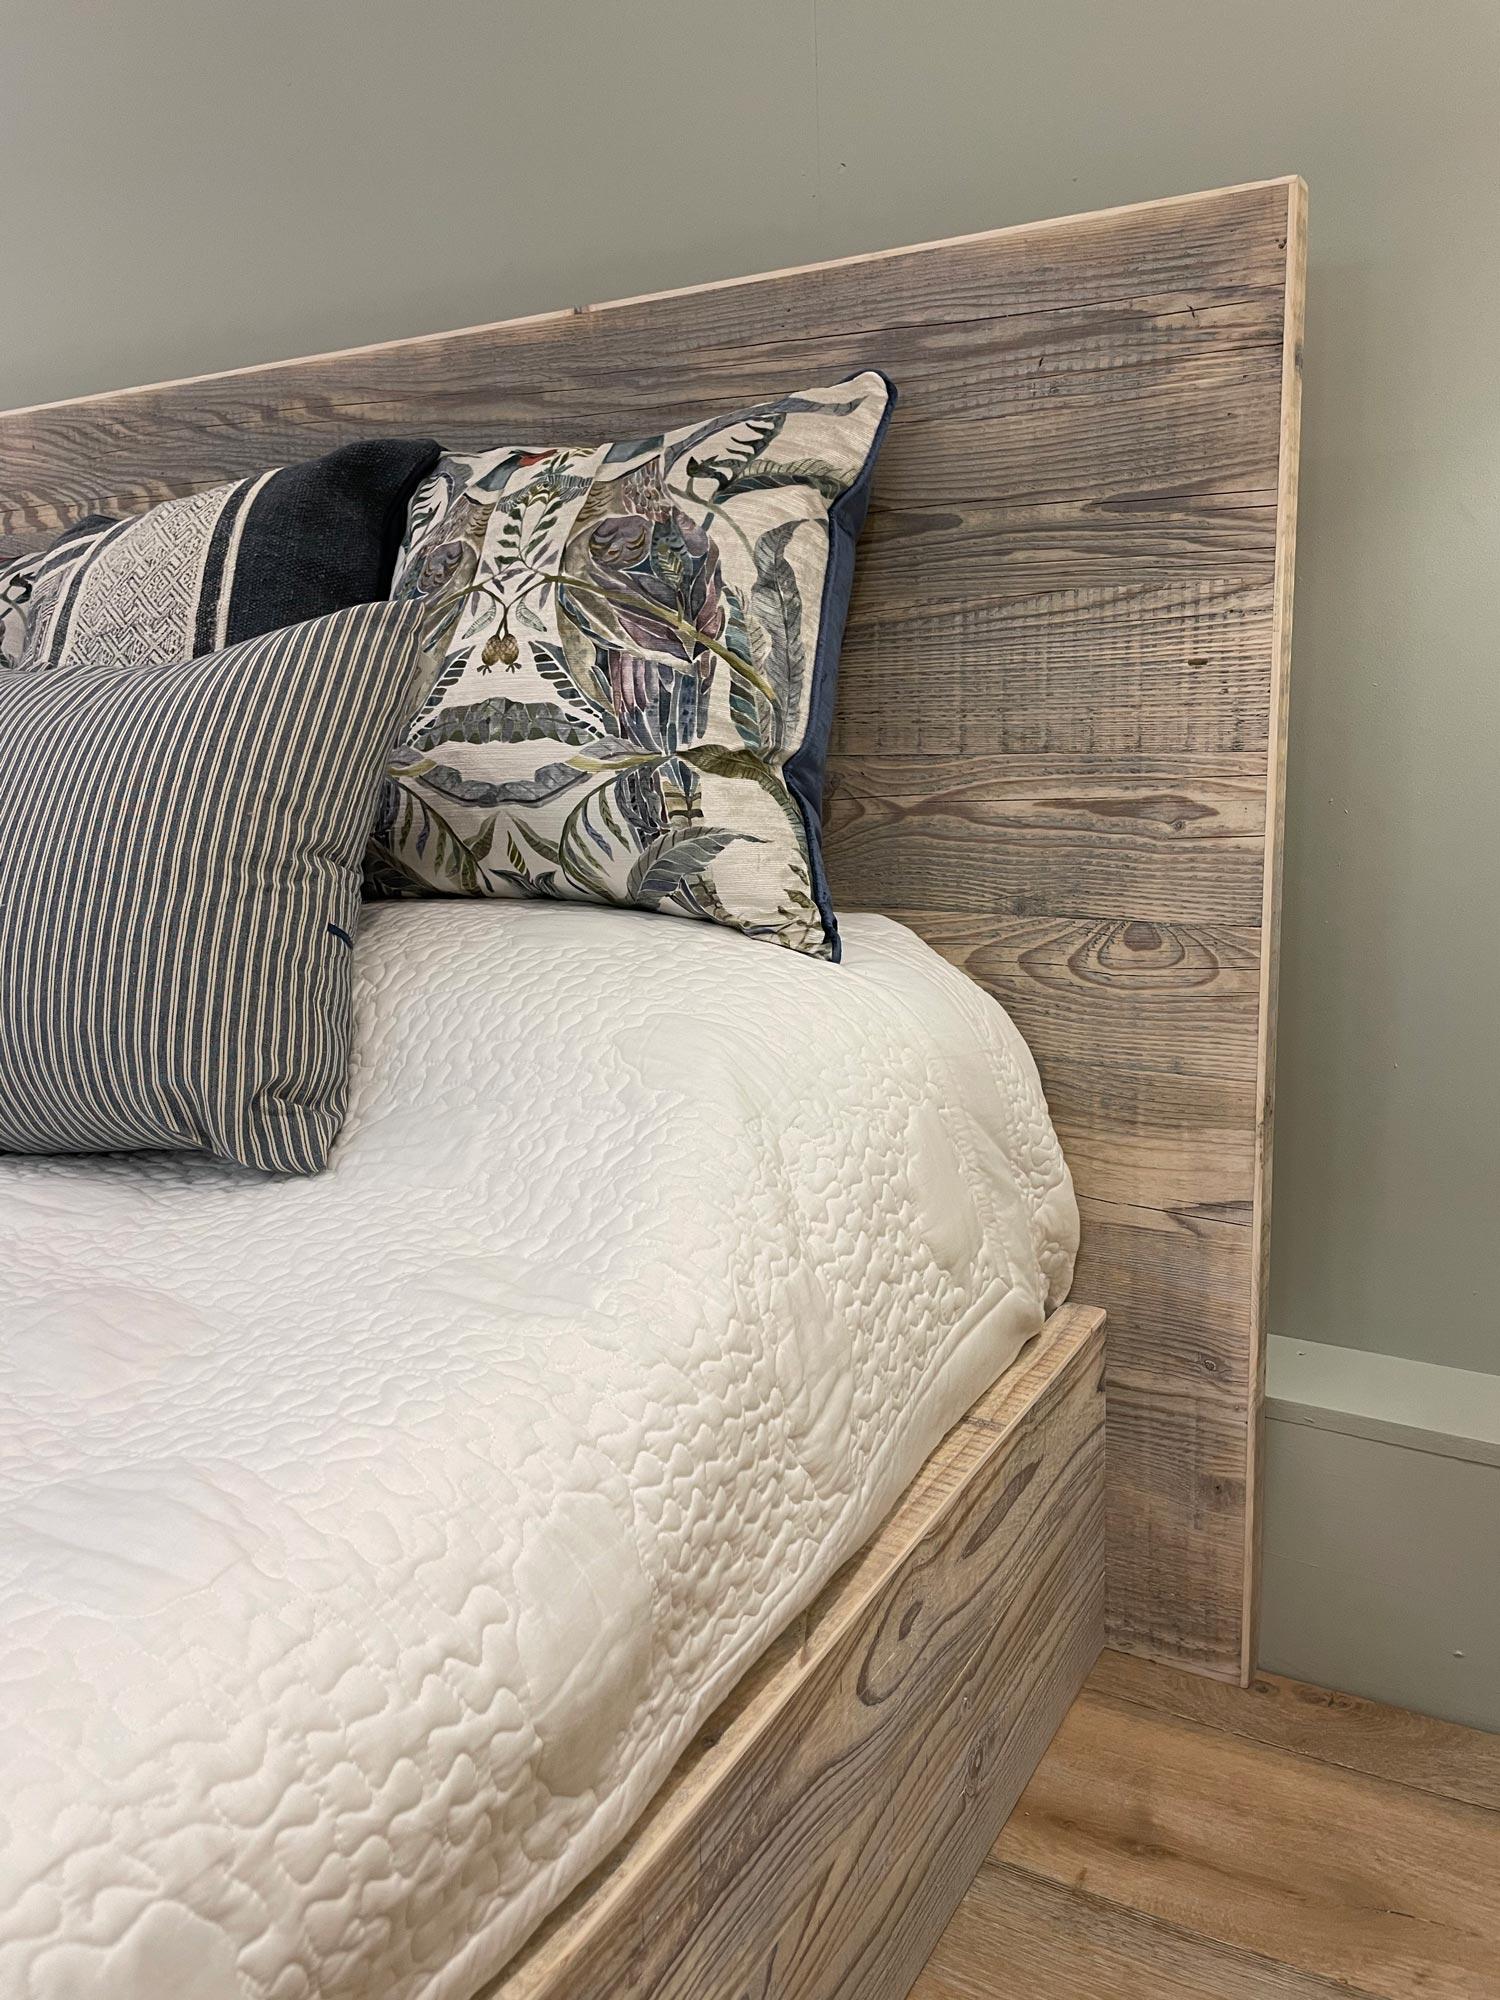 King size bed reclaimed wood headboard